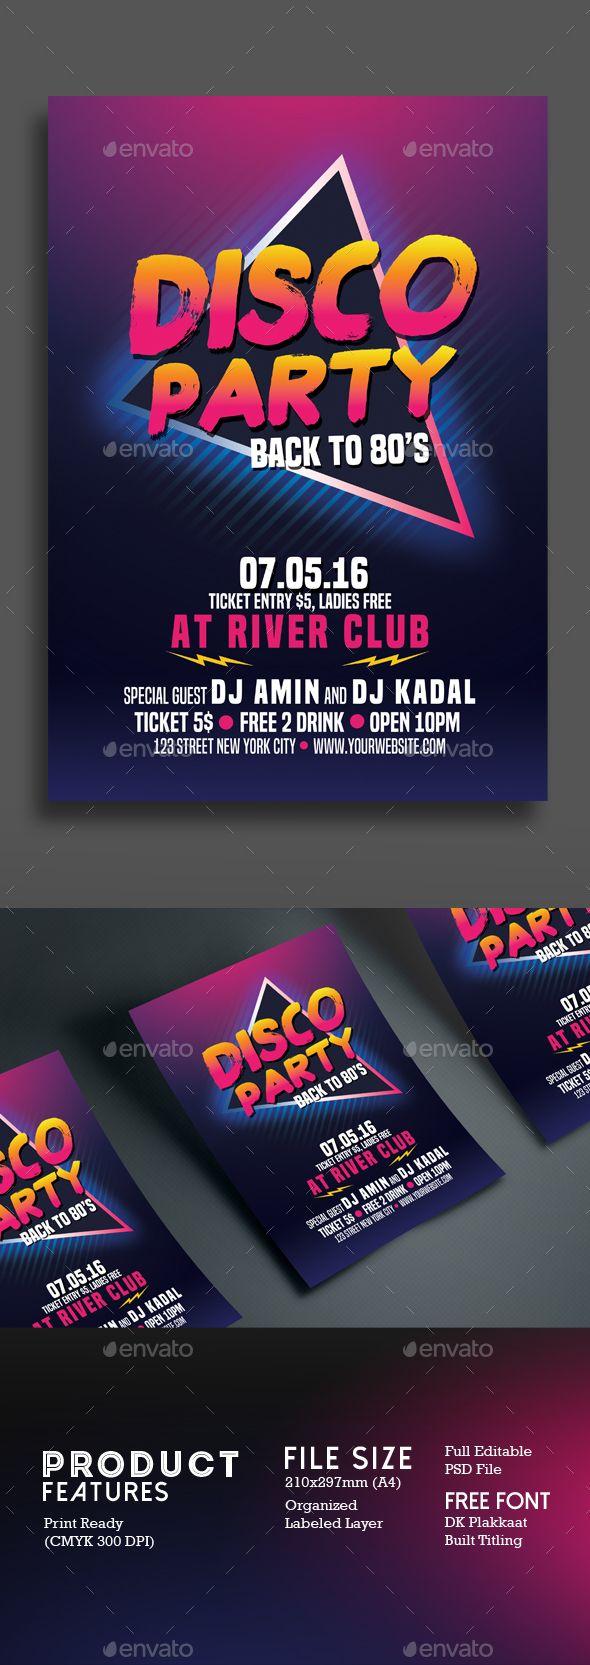 80s poster design - Disco Party 80 S